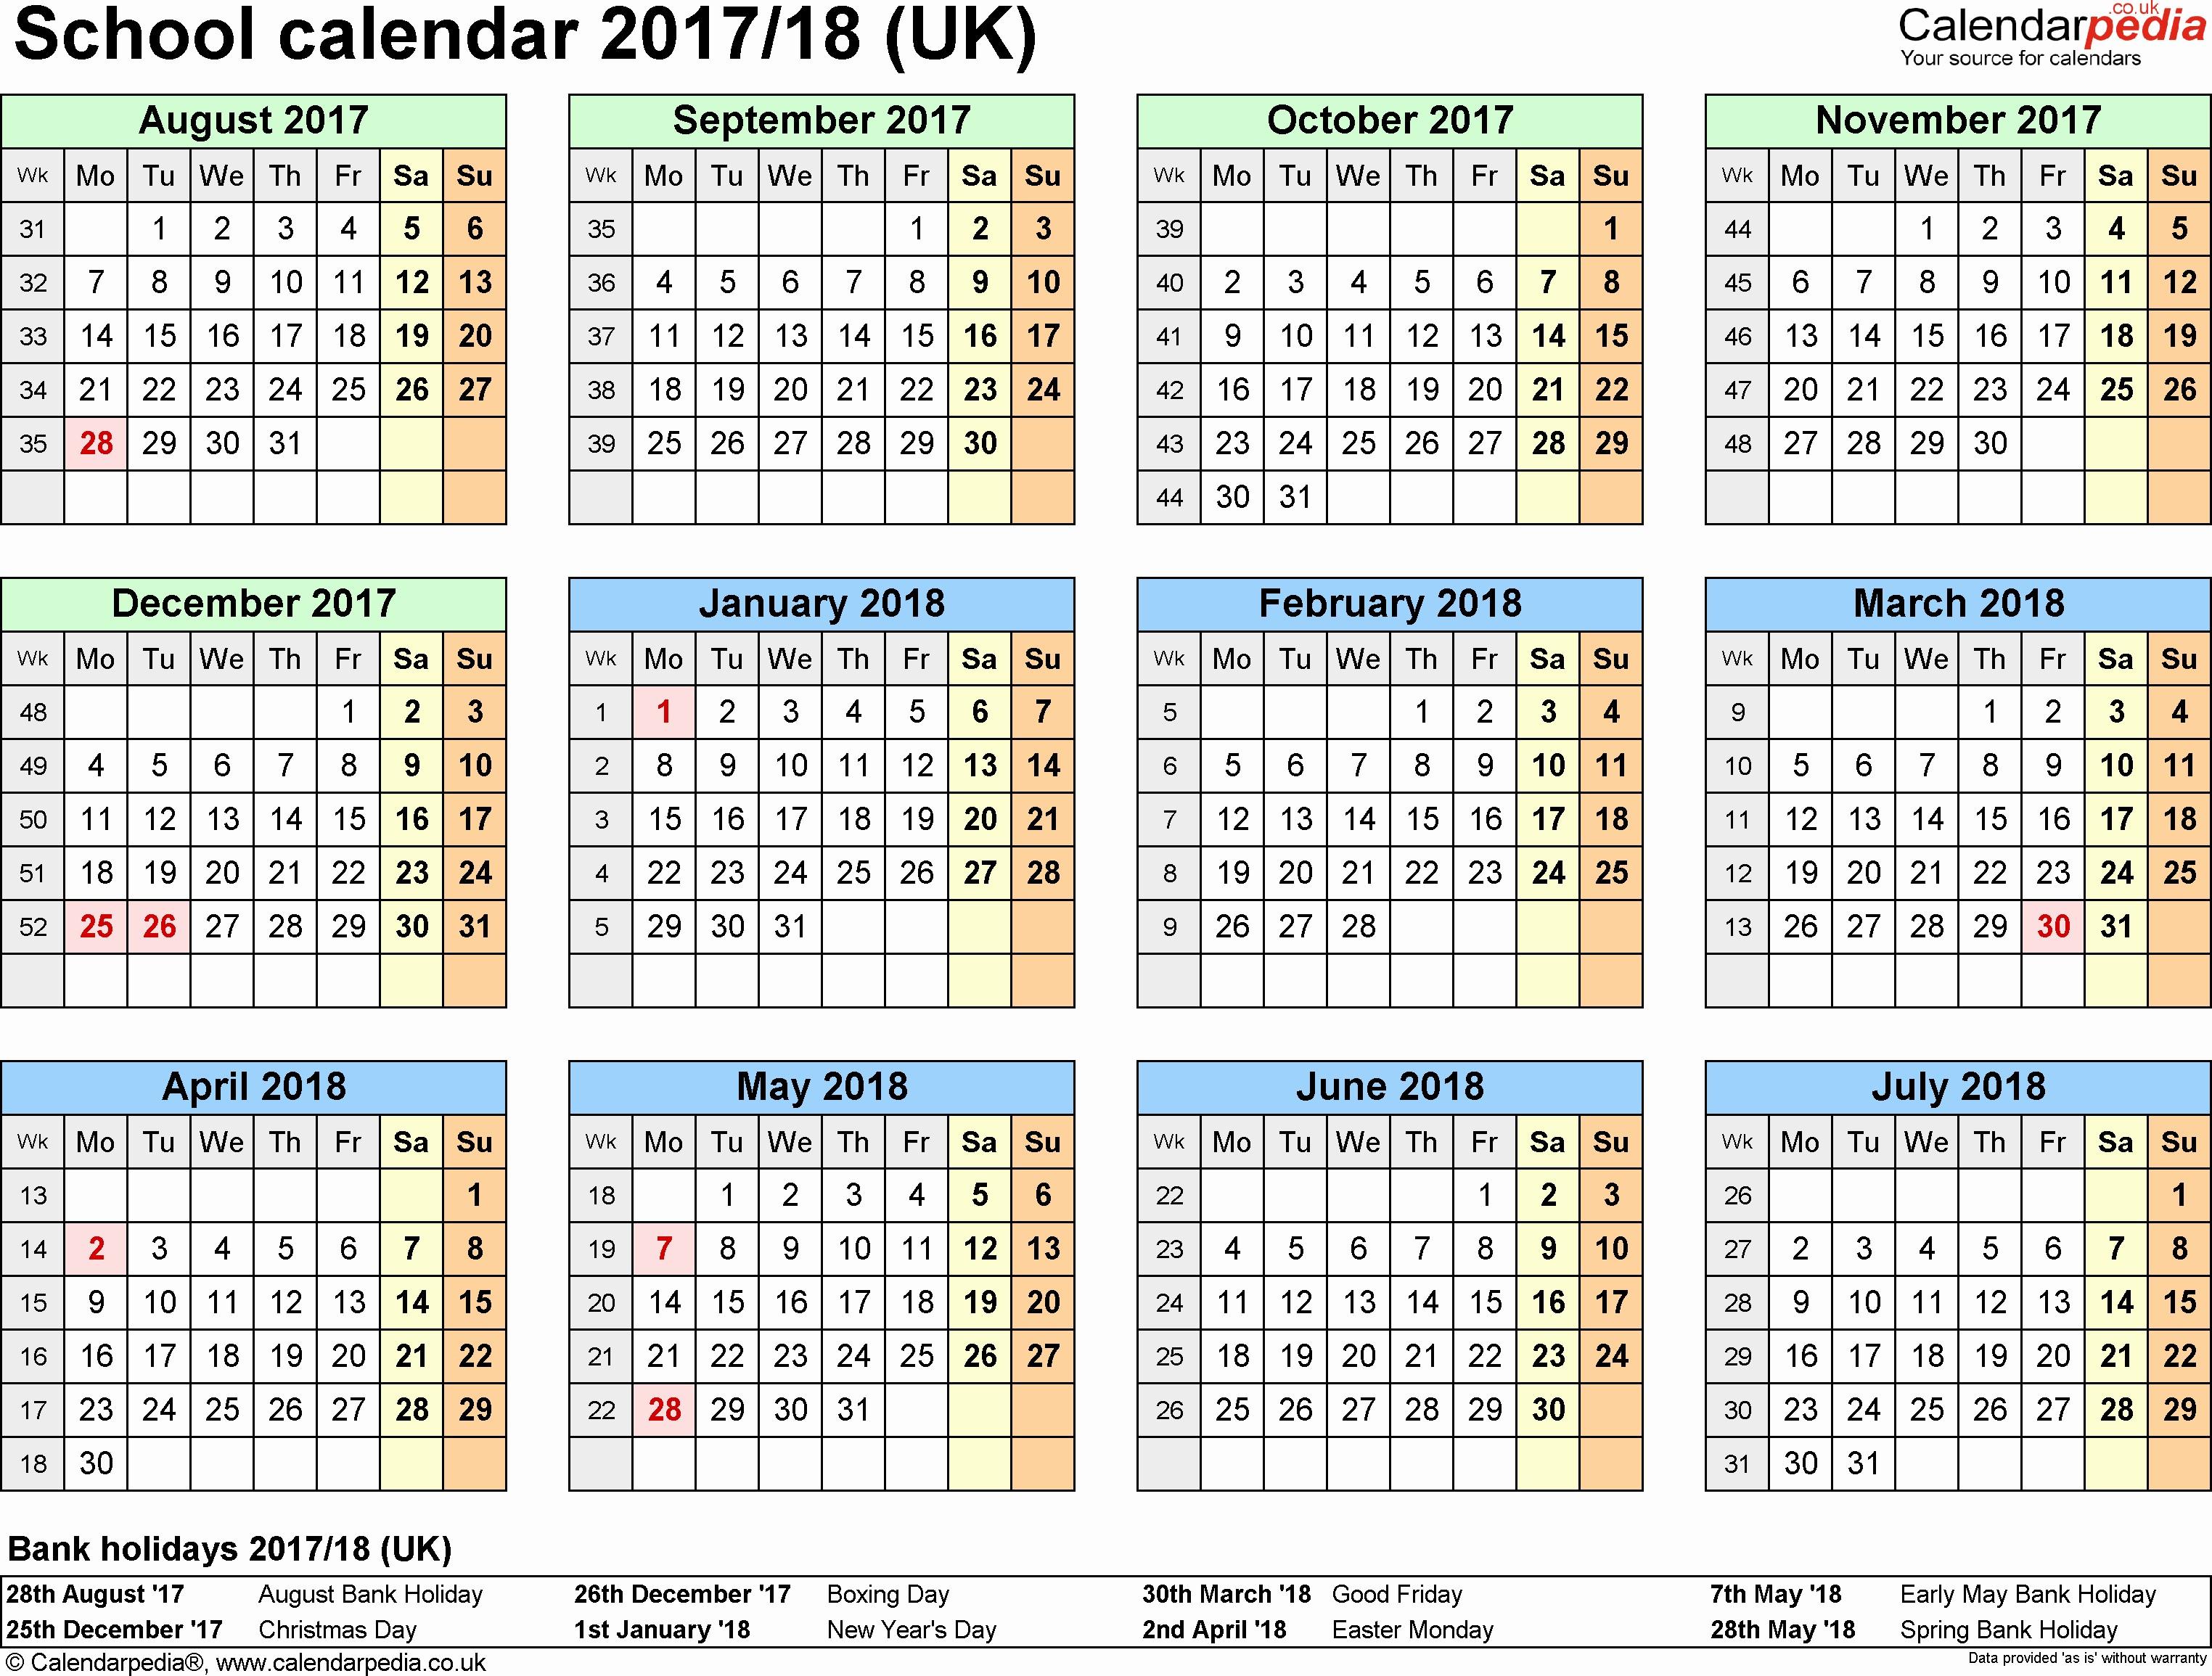 School Calendar 2018 19 2018 19 Two Year Calendars Printable